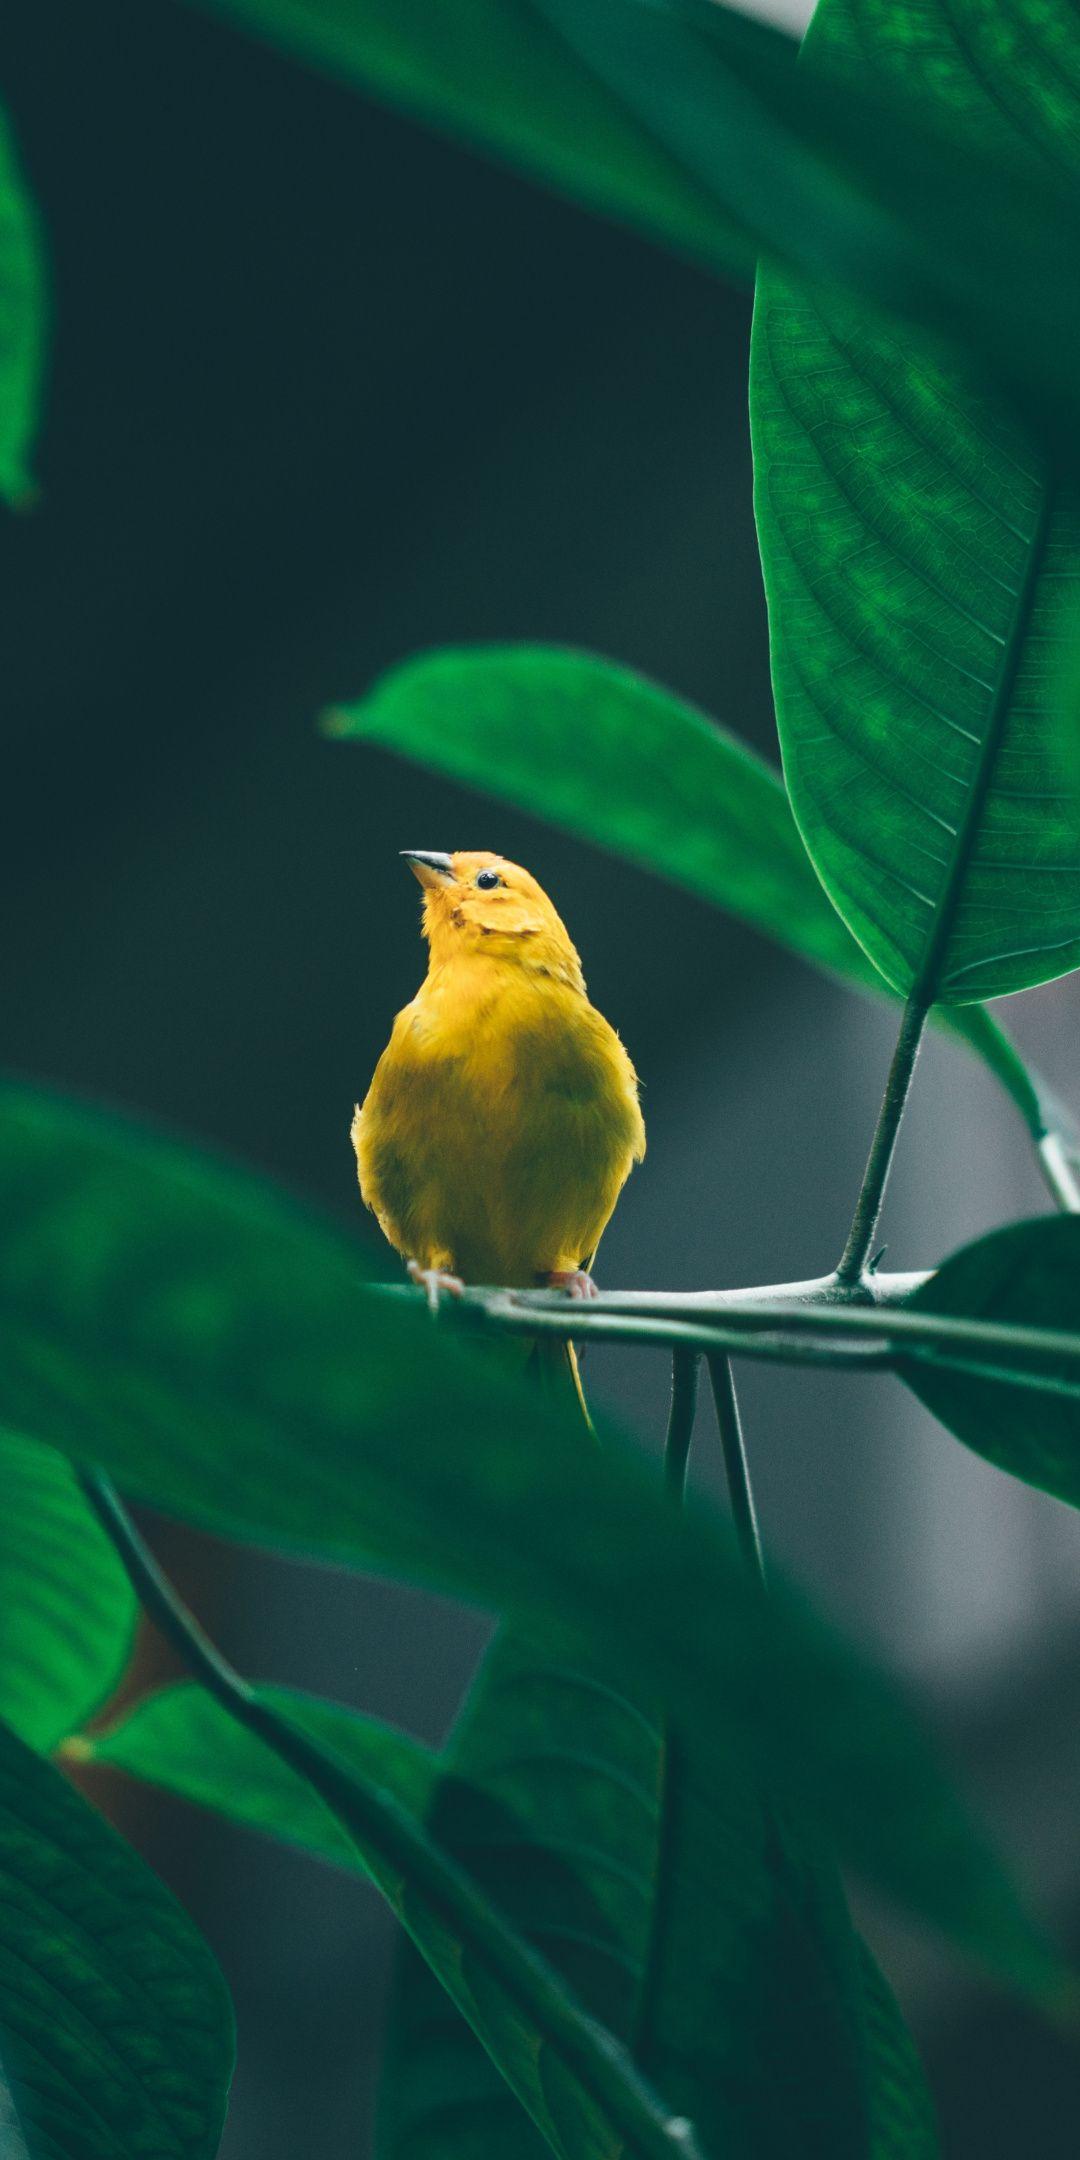 Small cute yellow bird tree branch 1080x2160 wallpaper Birds 1080x2160